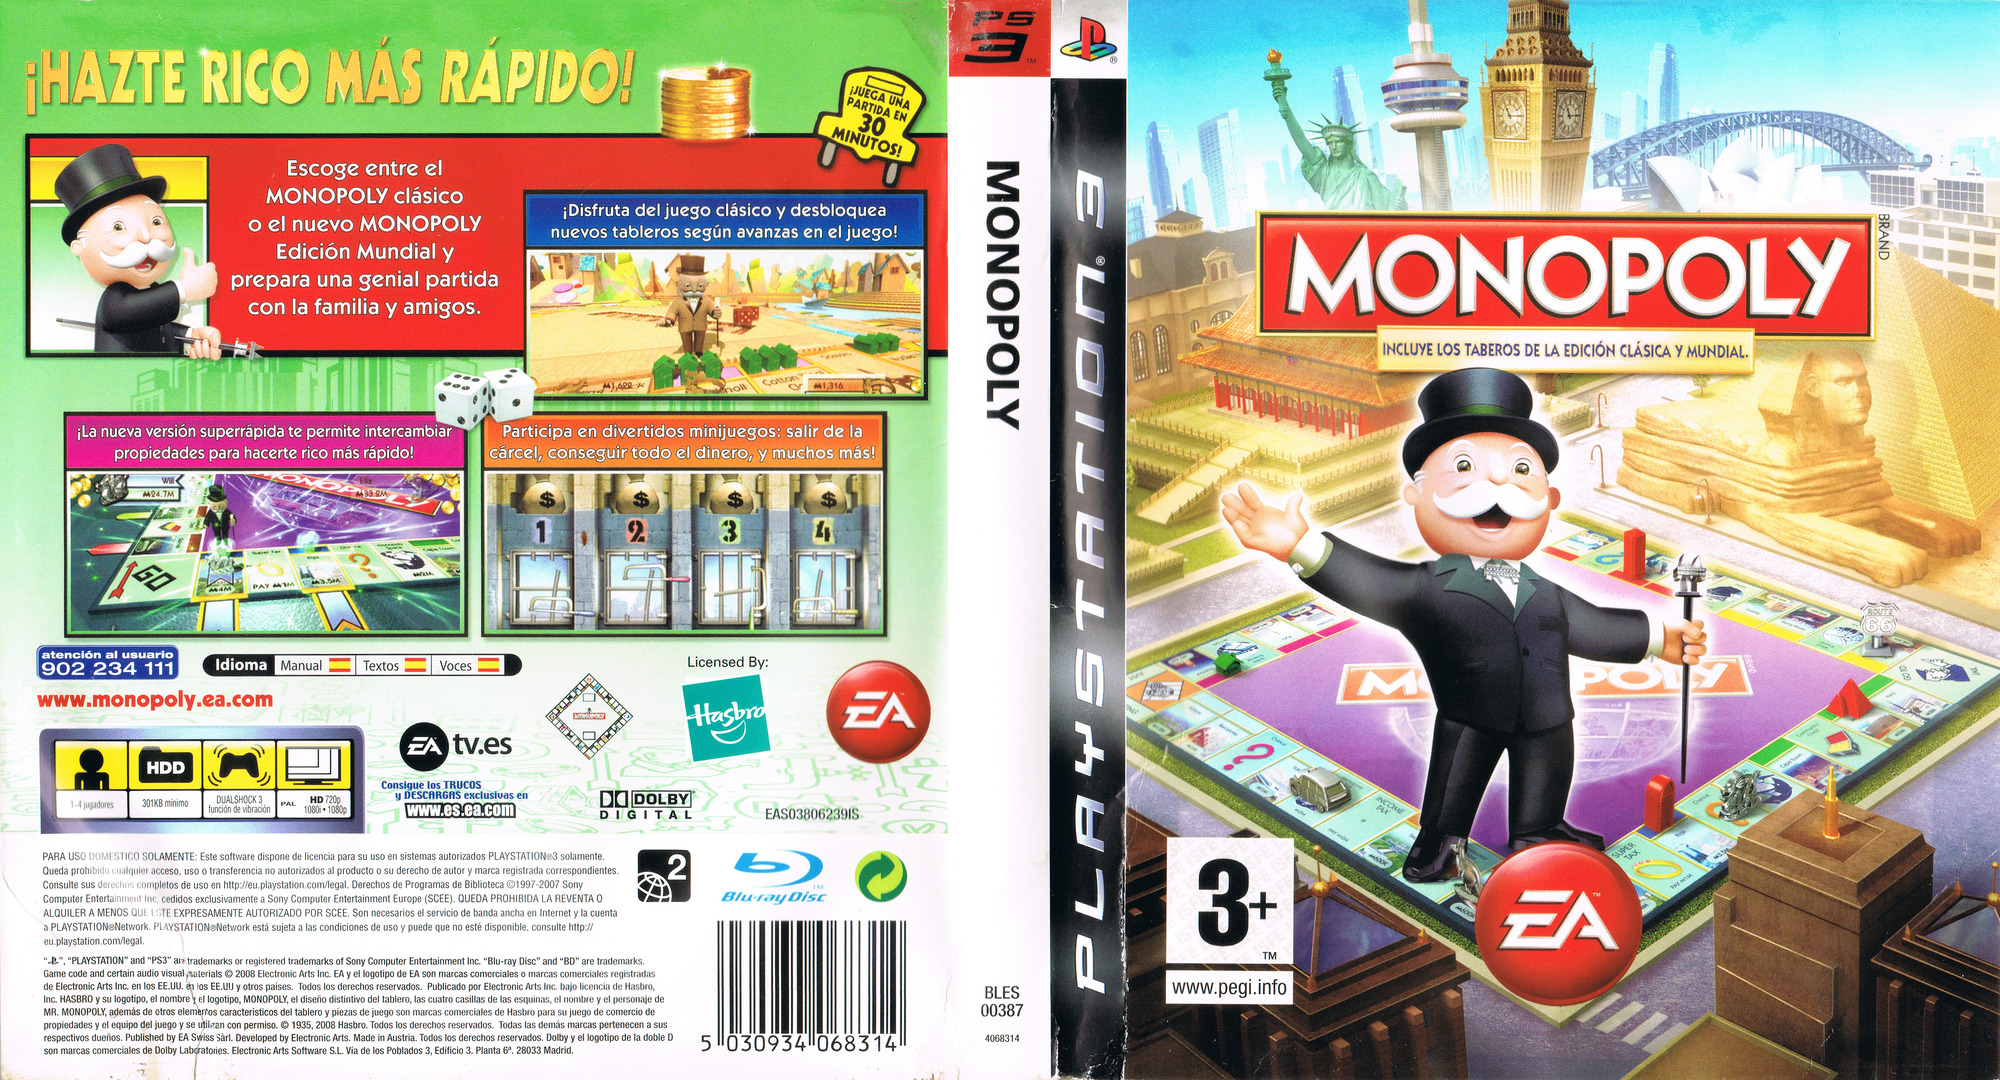 PS3 coverfullHQ (BLES00387)